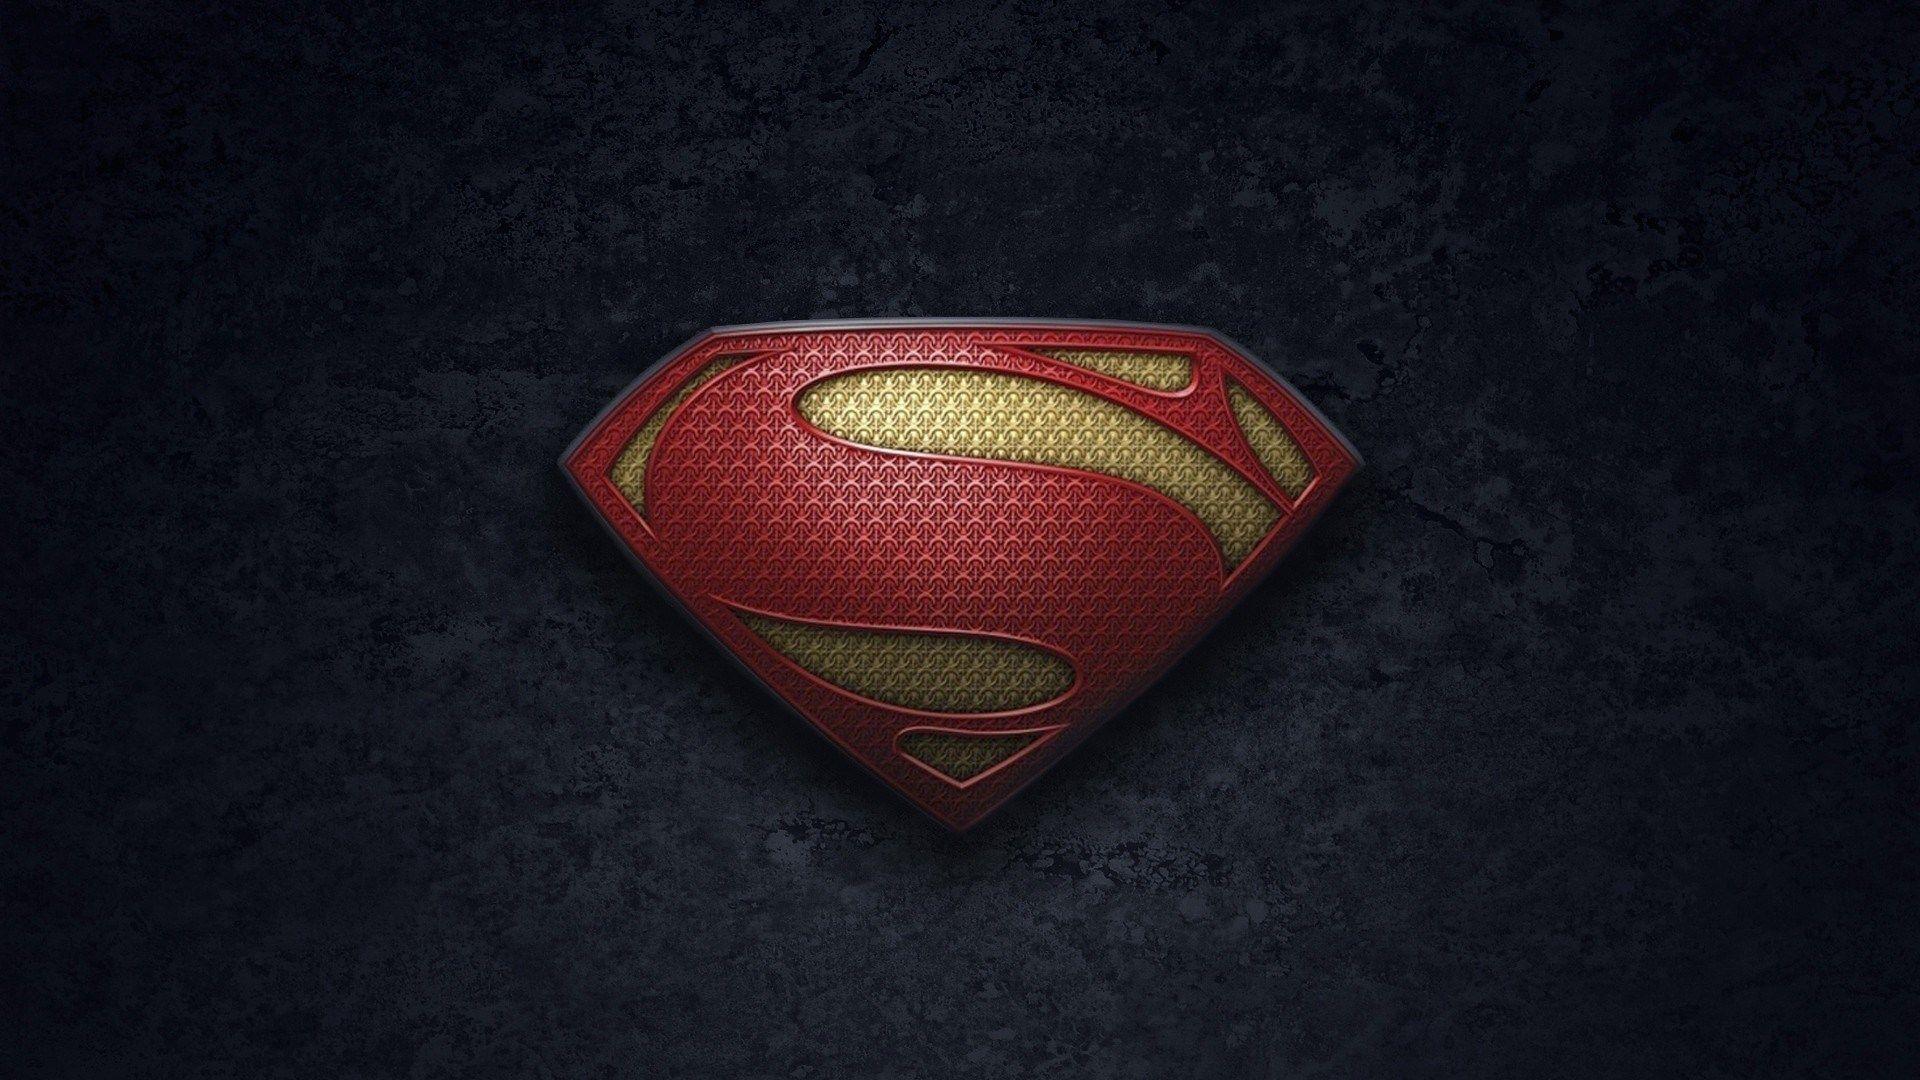 Image For Desktop Man Of Steel With Images Logo Wallpaper Hd